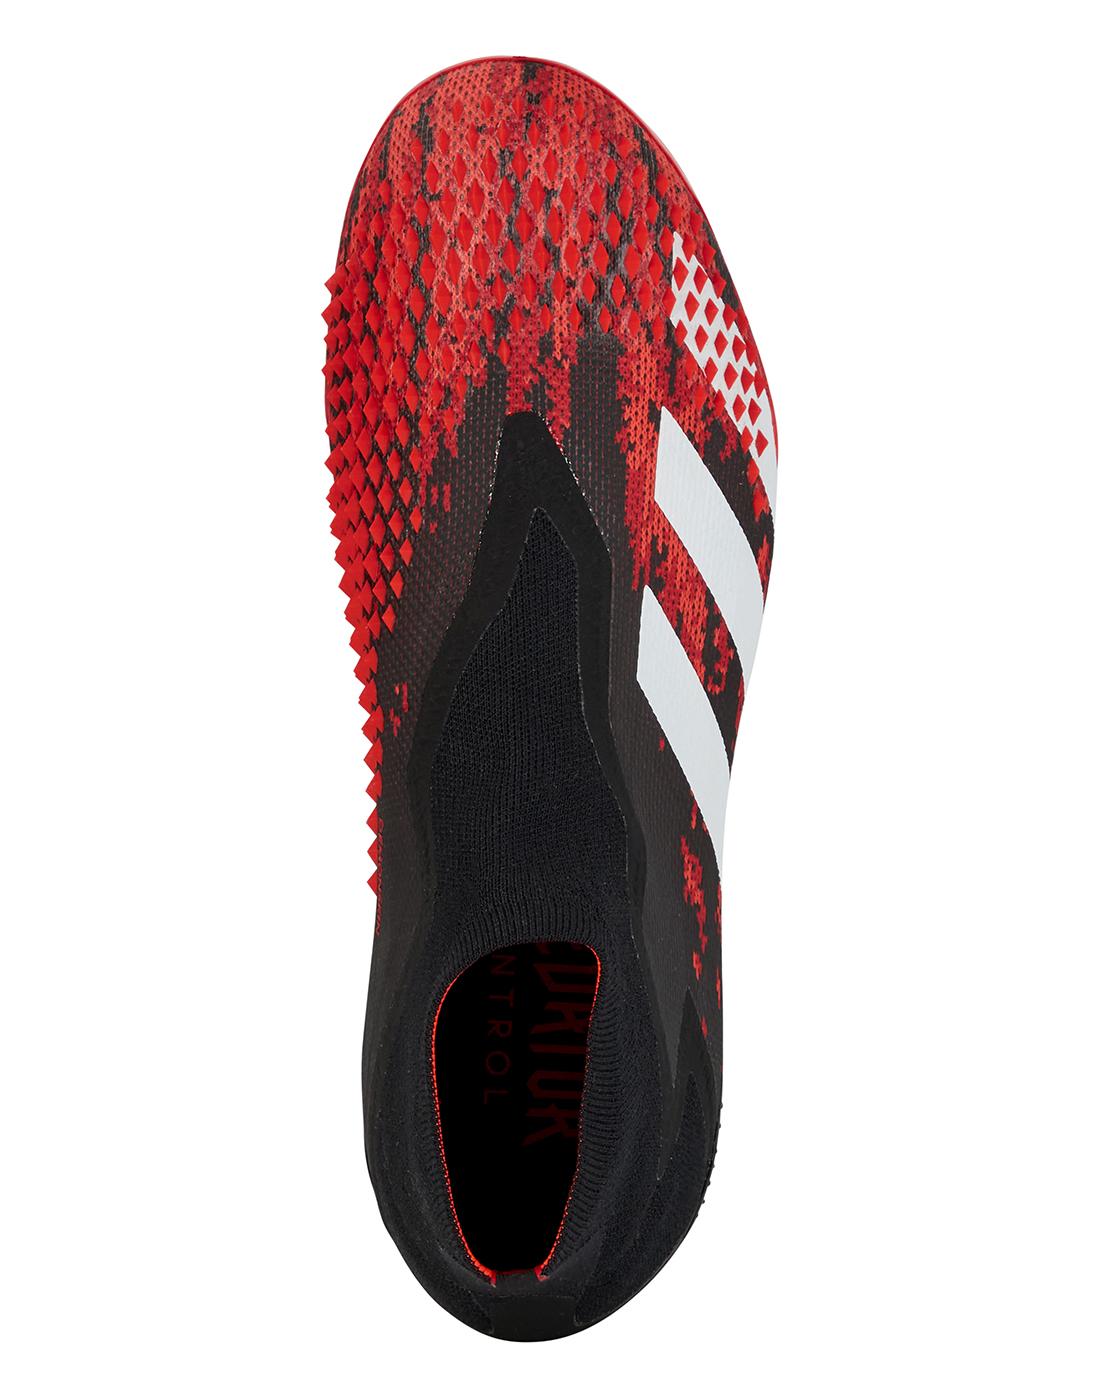 Buy adidas Black Predator 20 Goalkeeper Gloves from the.